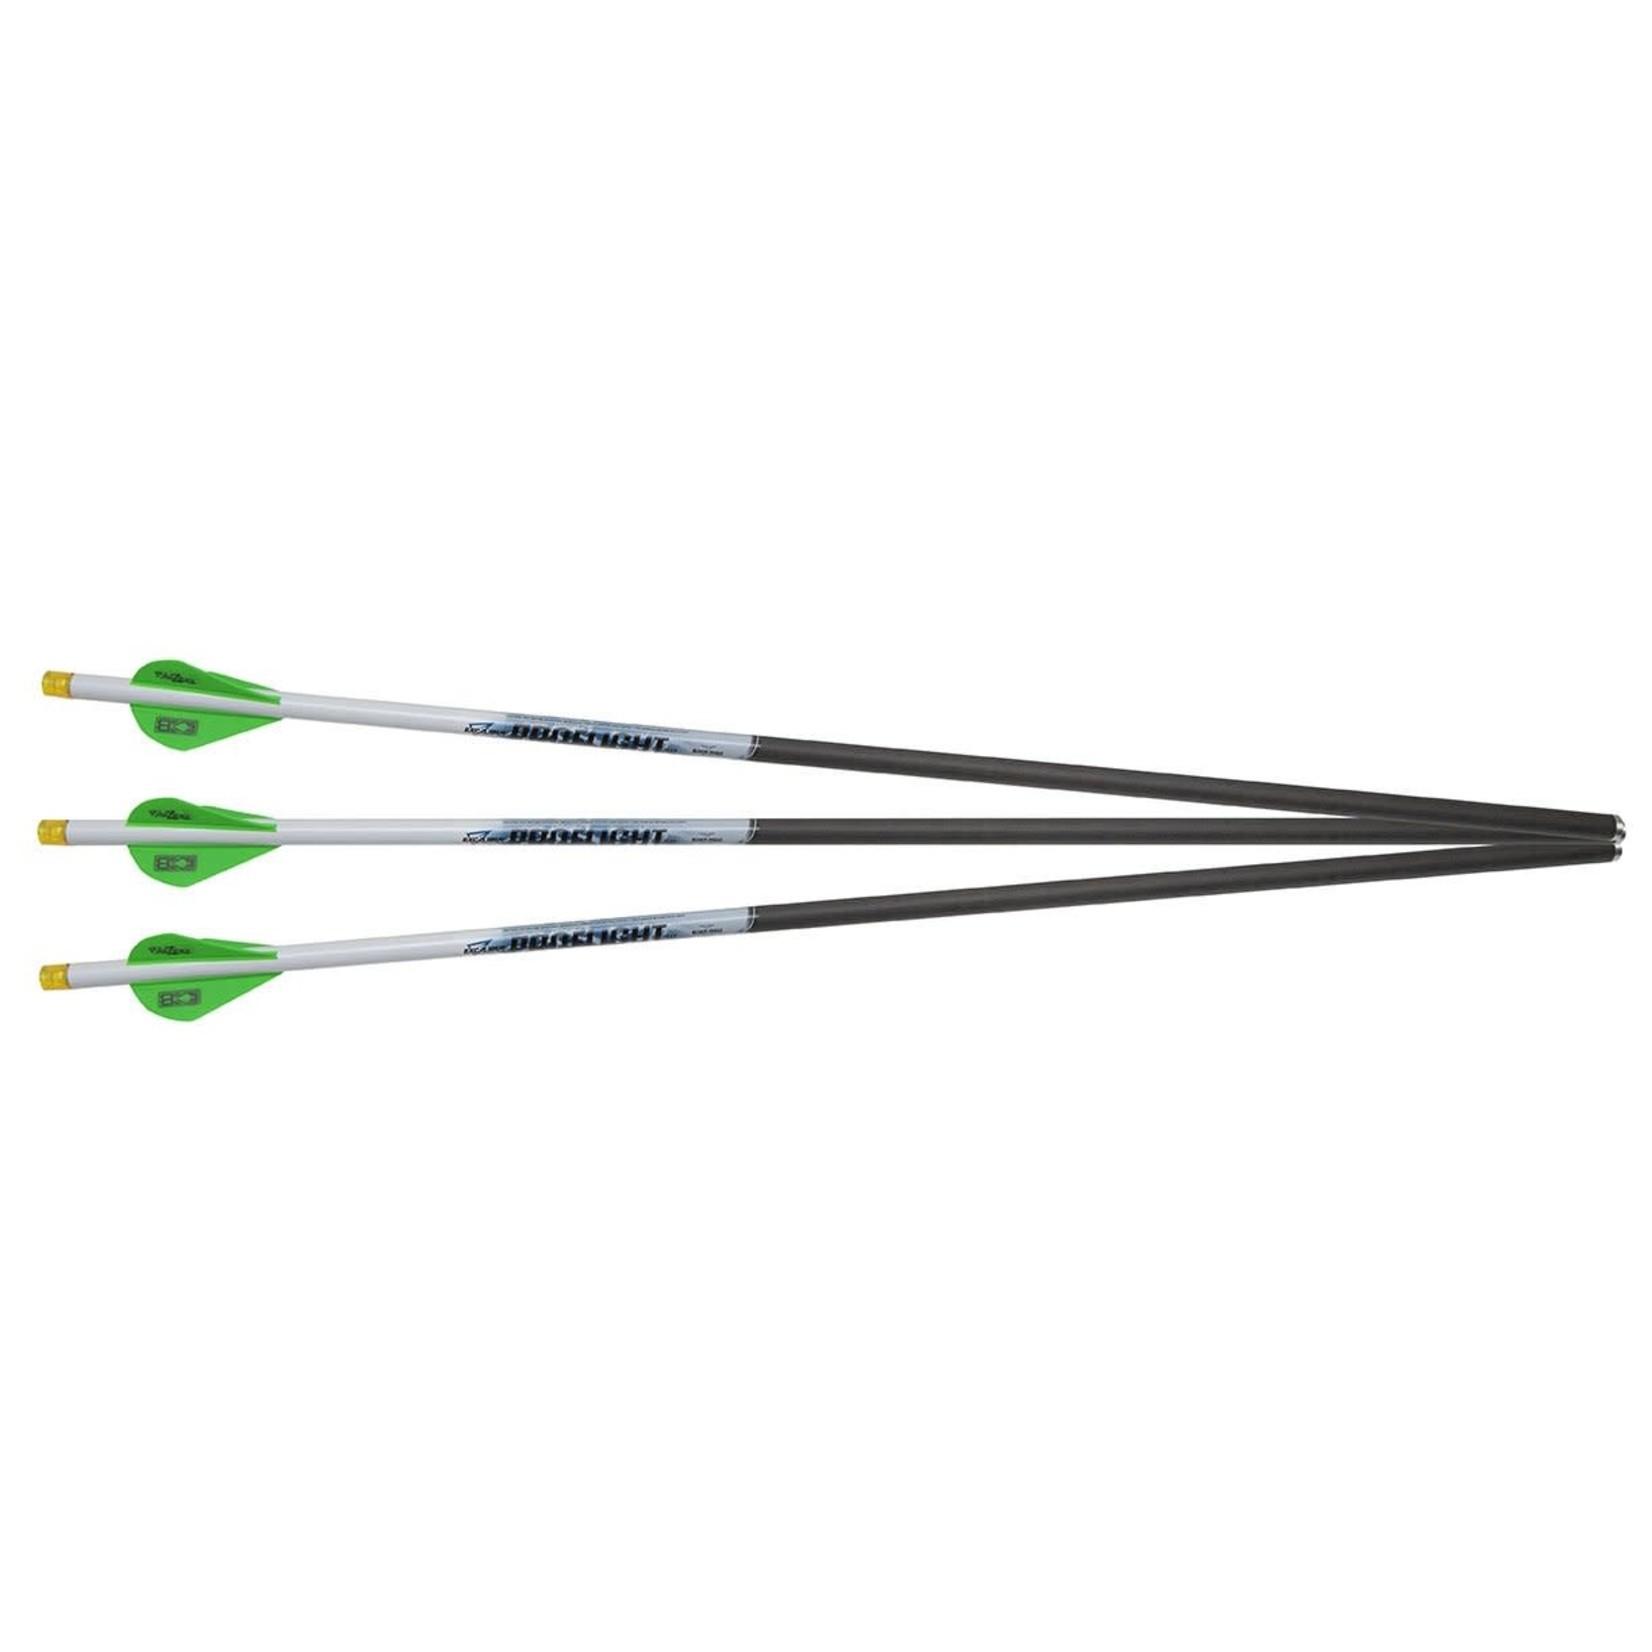 "Excalibur Excalibur Proflight 18"" Arrows (6 Pk)"